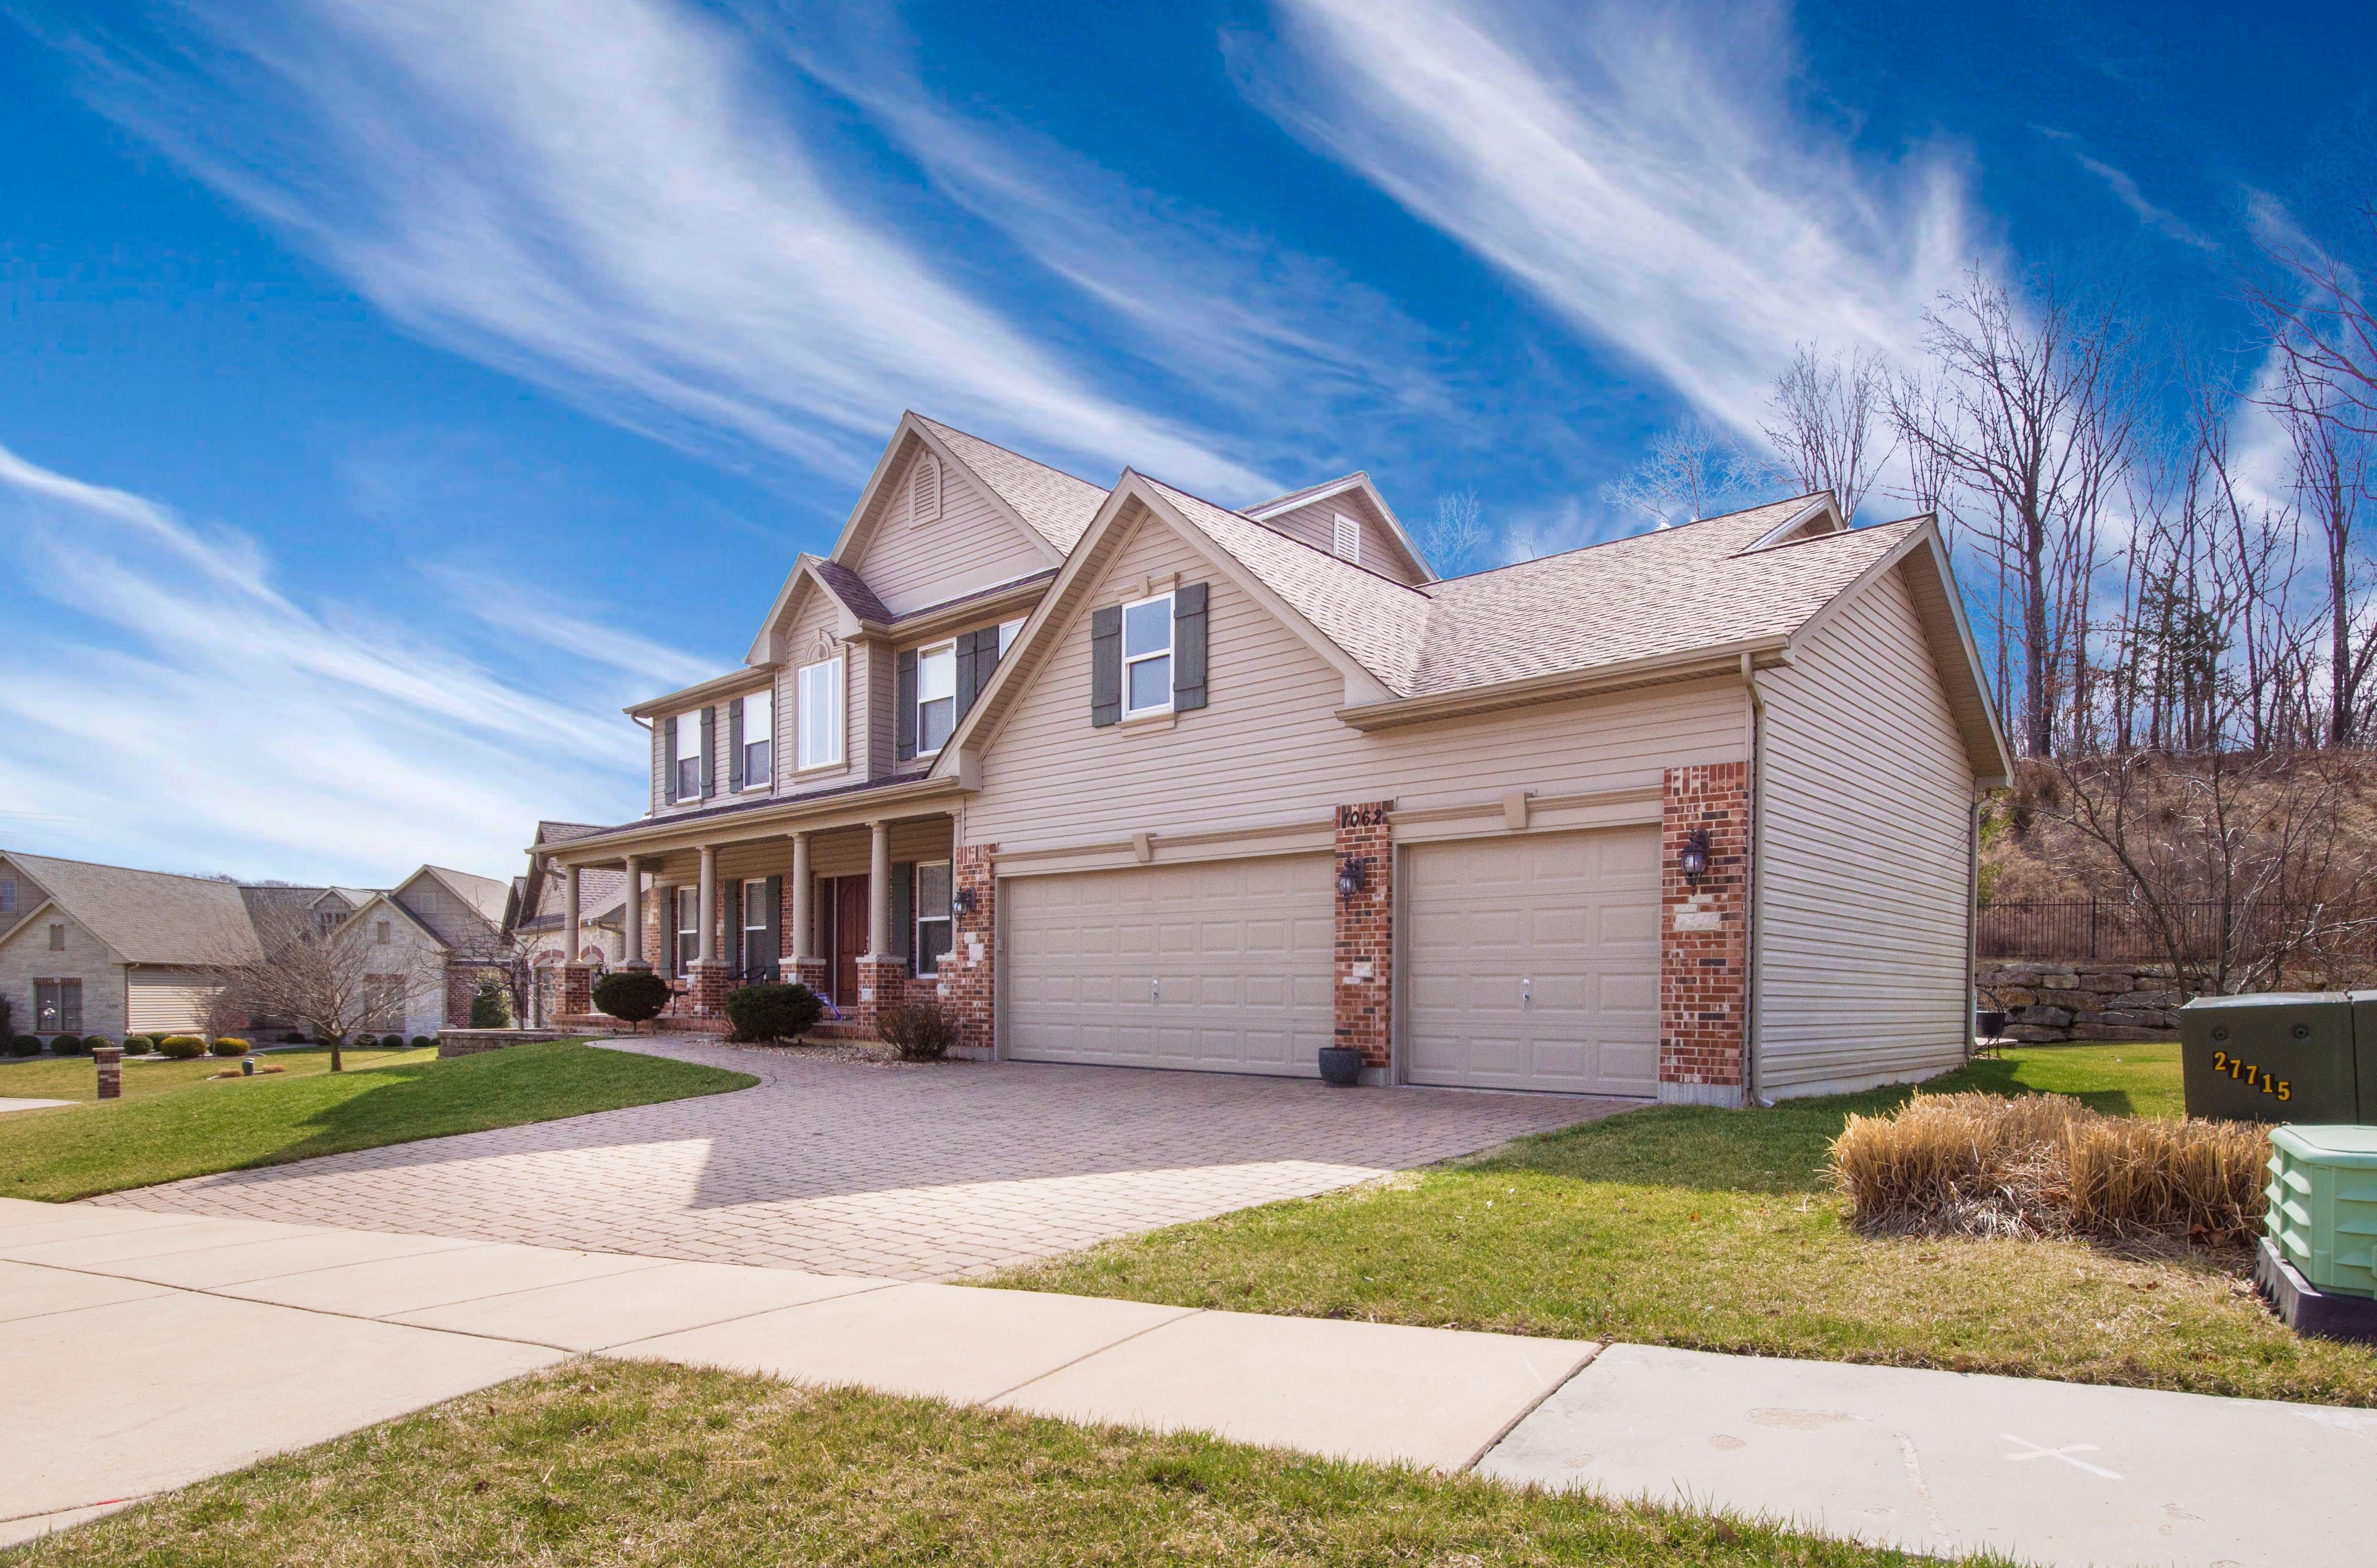 Riverside-county-rental-homes